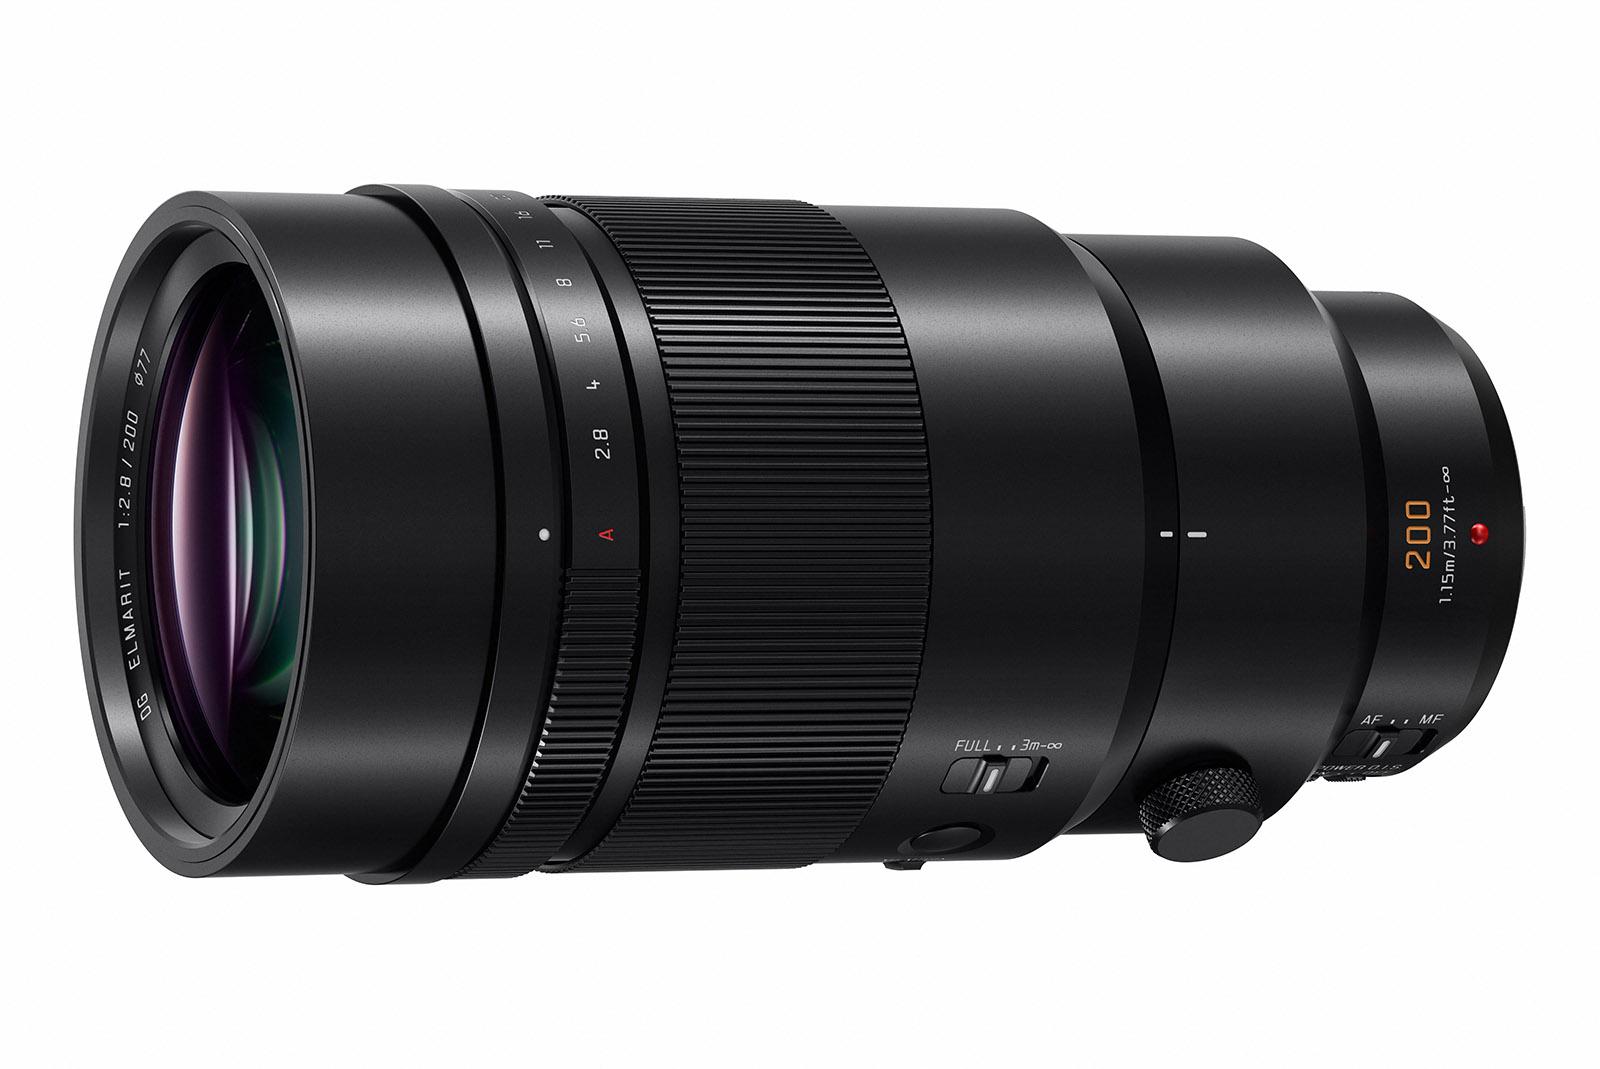 Panasonic's photo-centric Lumix G9 borrows from the GH5